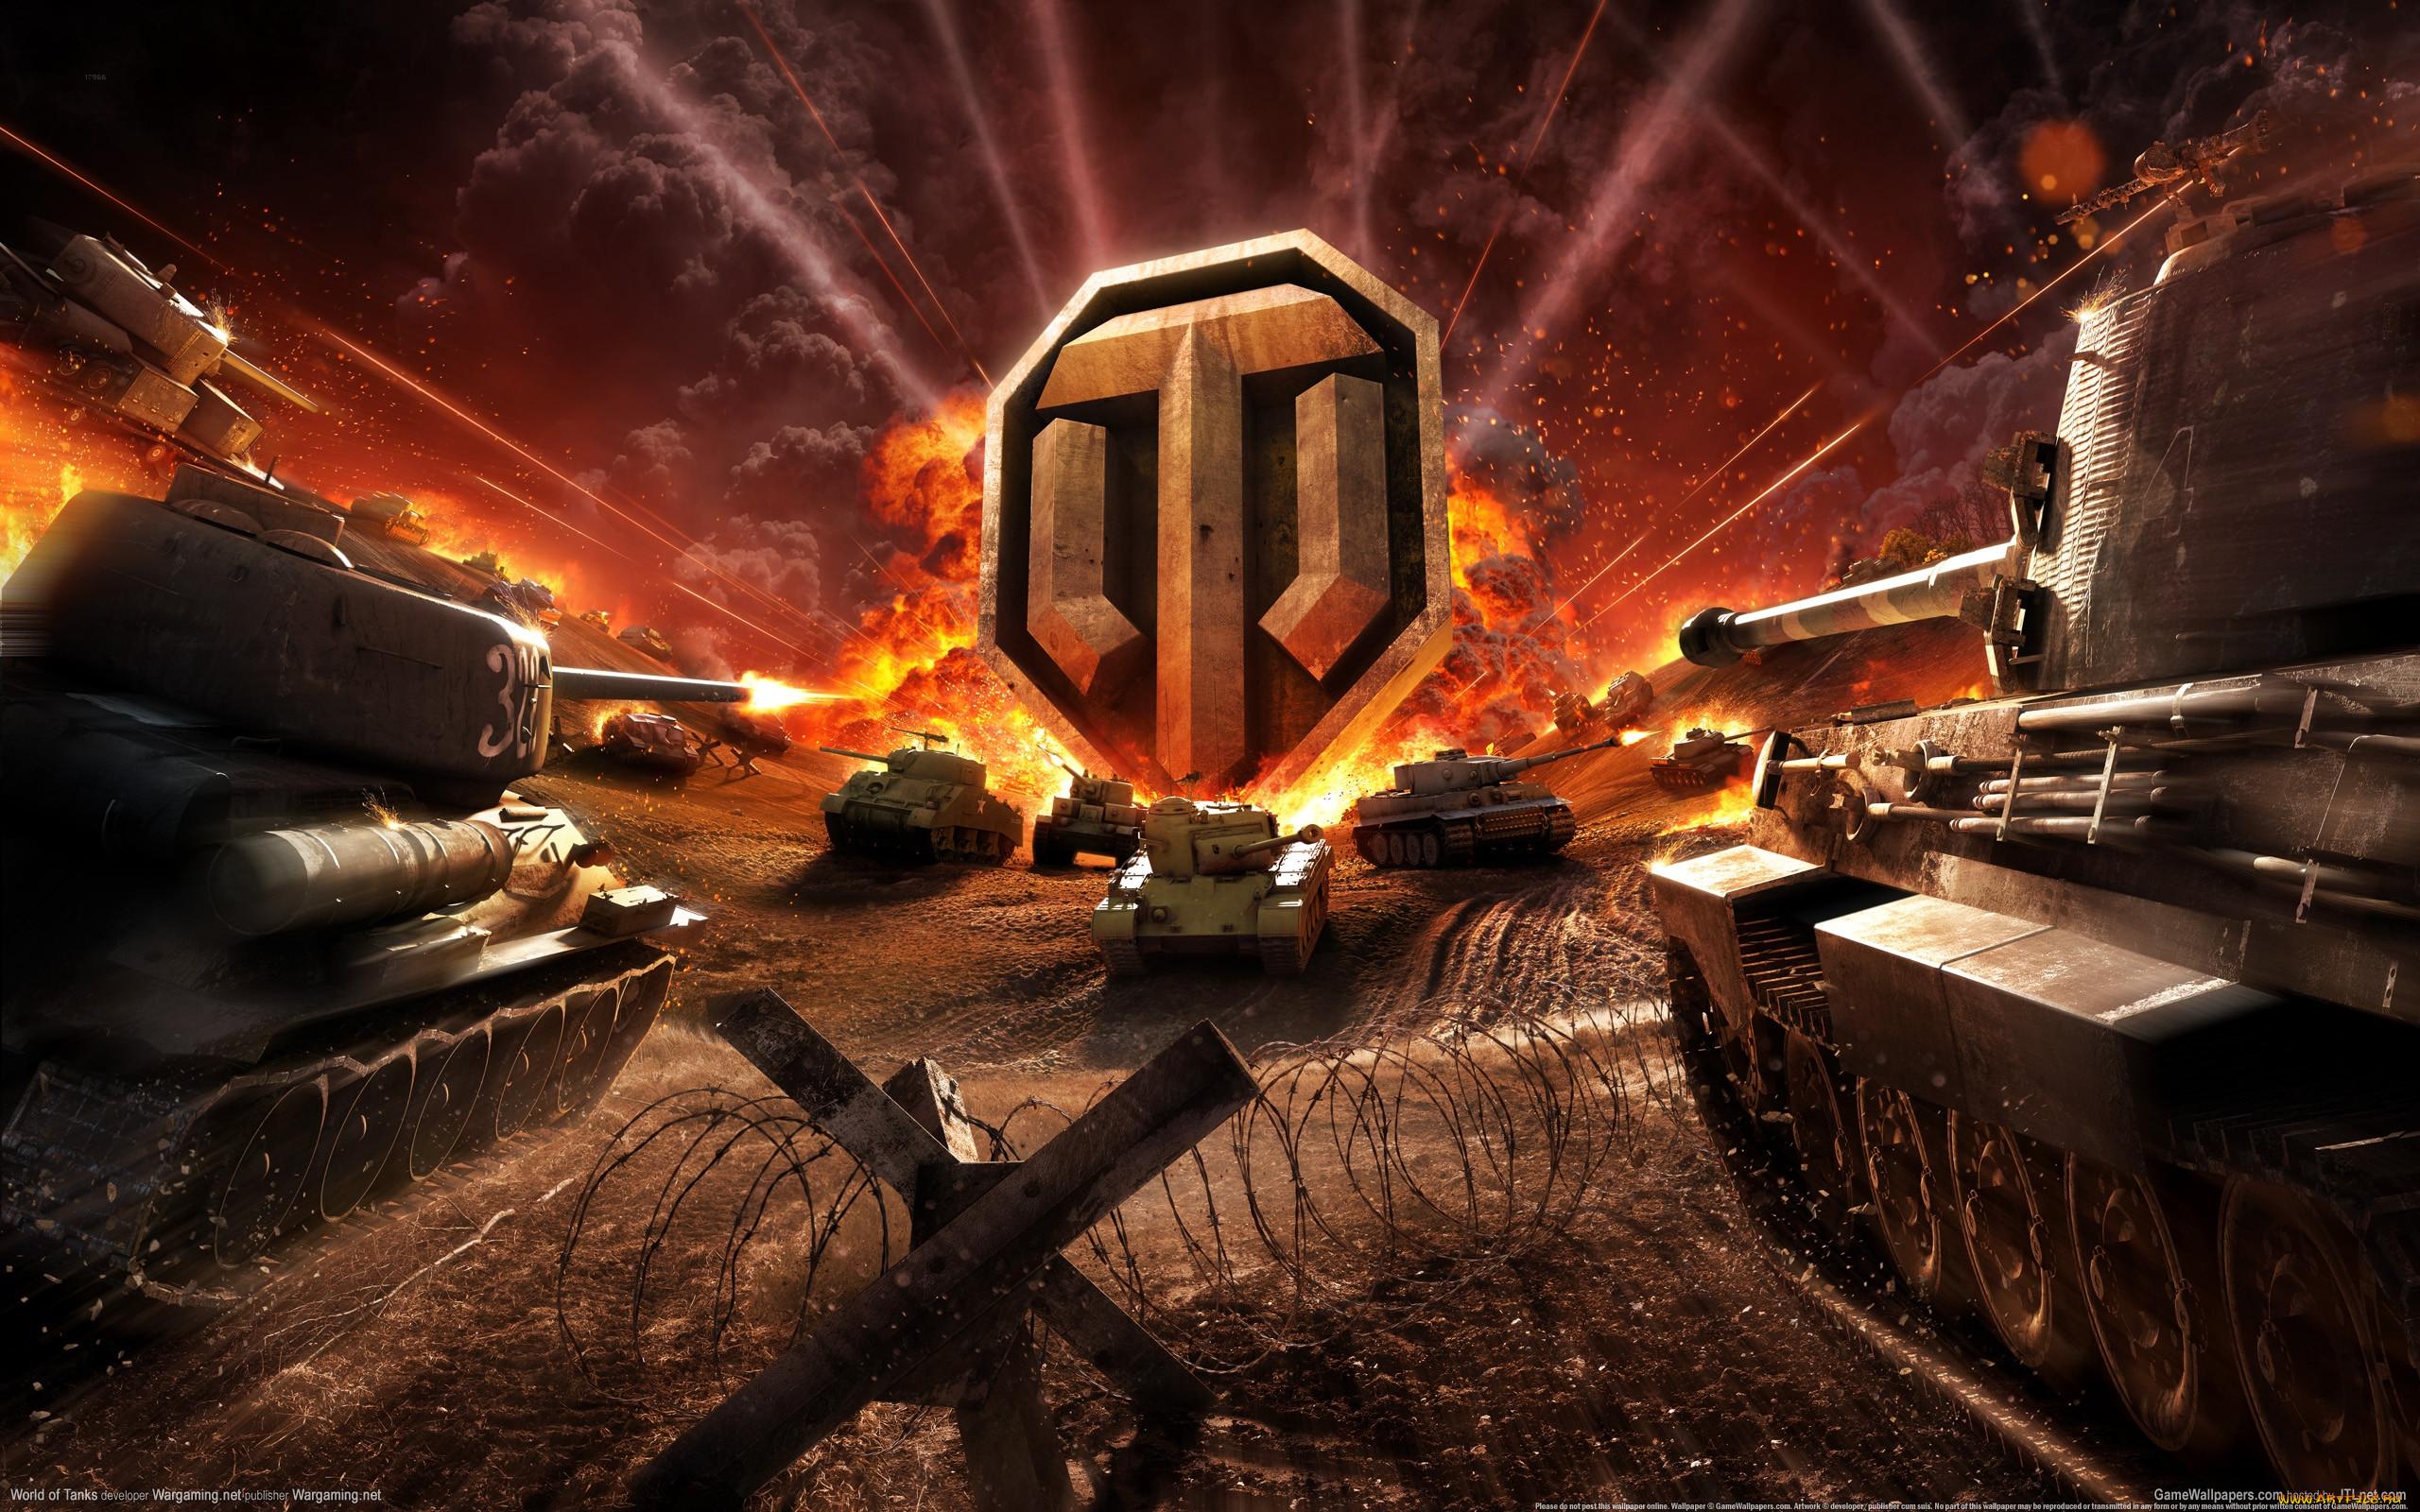 World of tanks №531808 видео игры мир танков